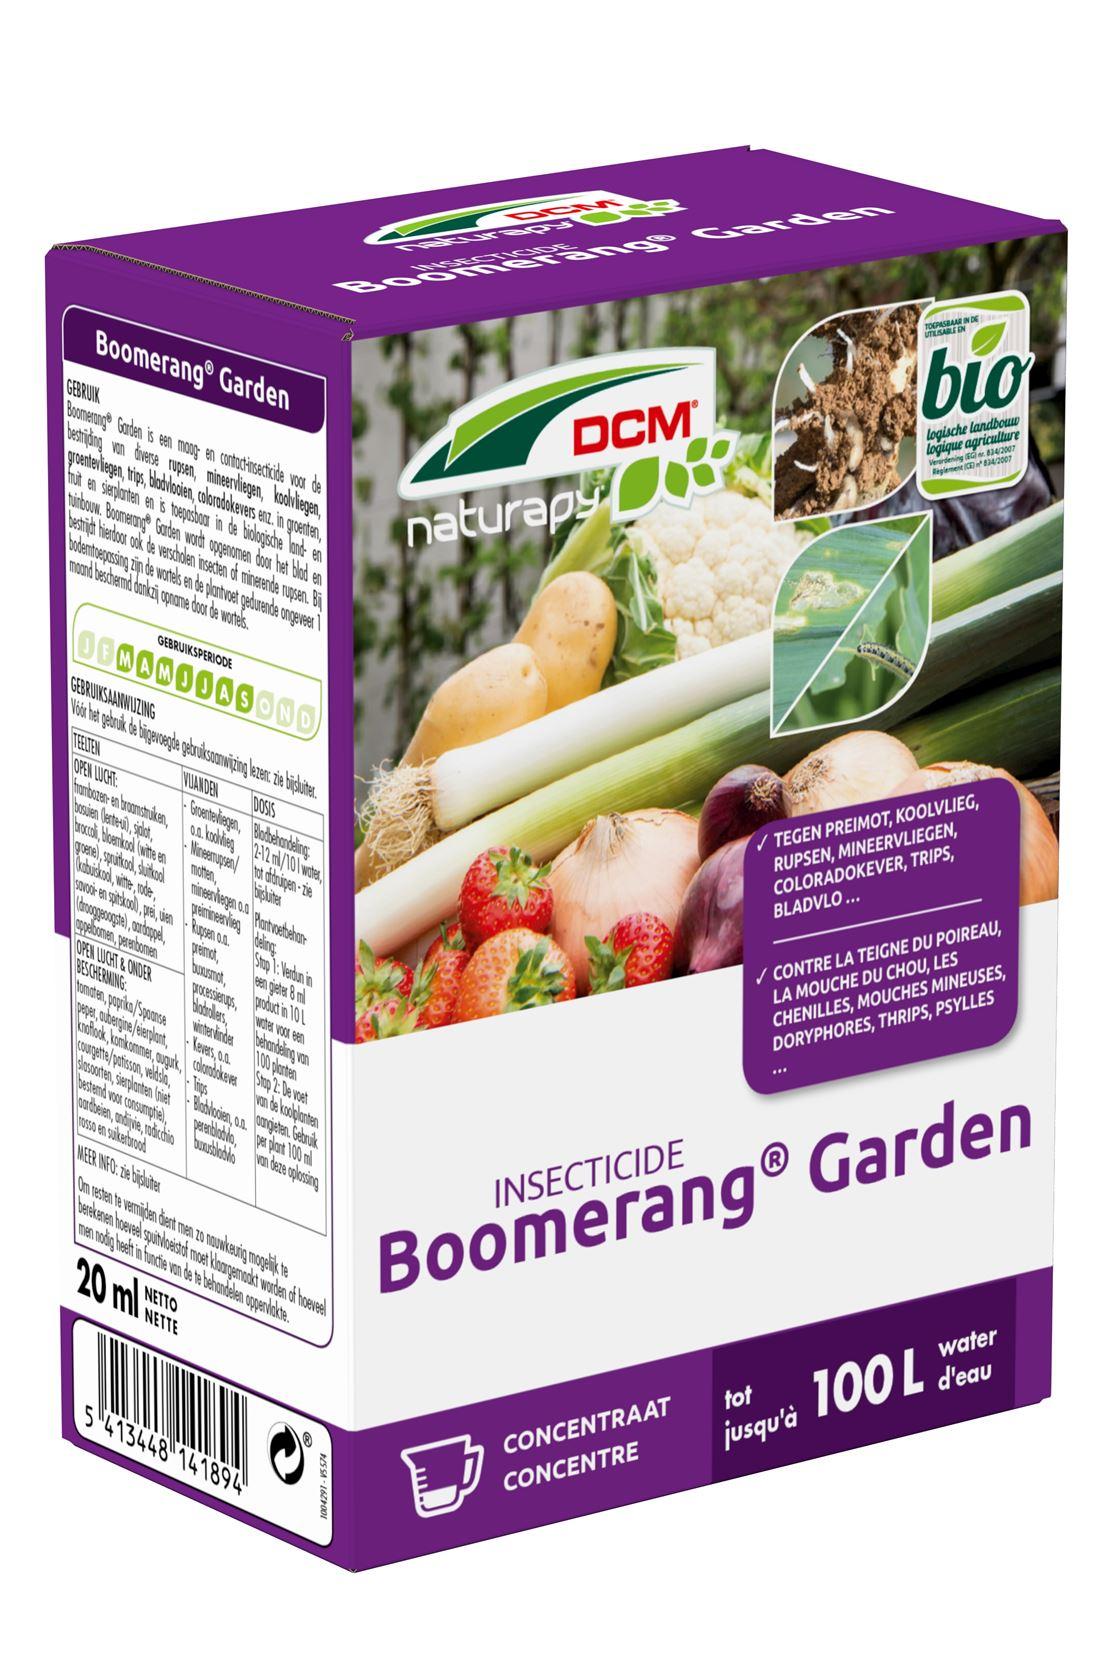 DCM boomerang garden moestuin - 20ml - bio